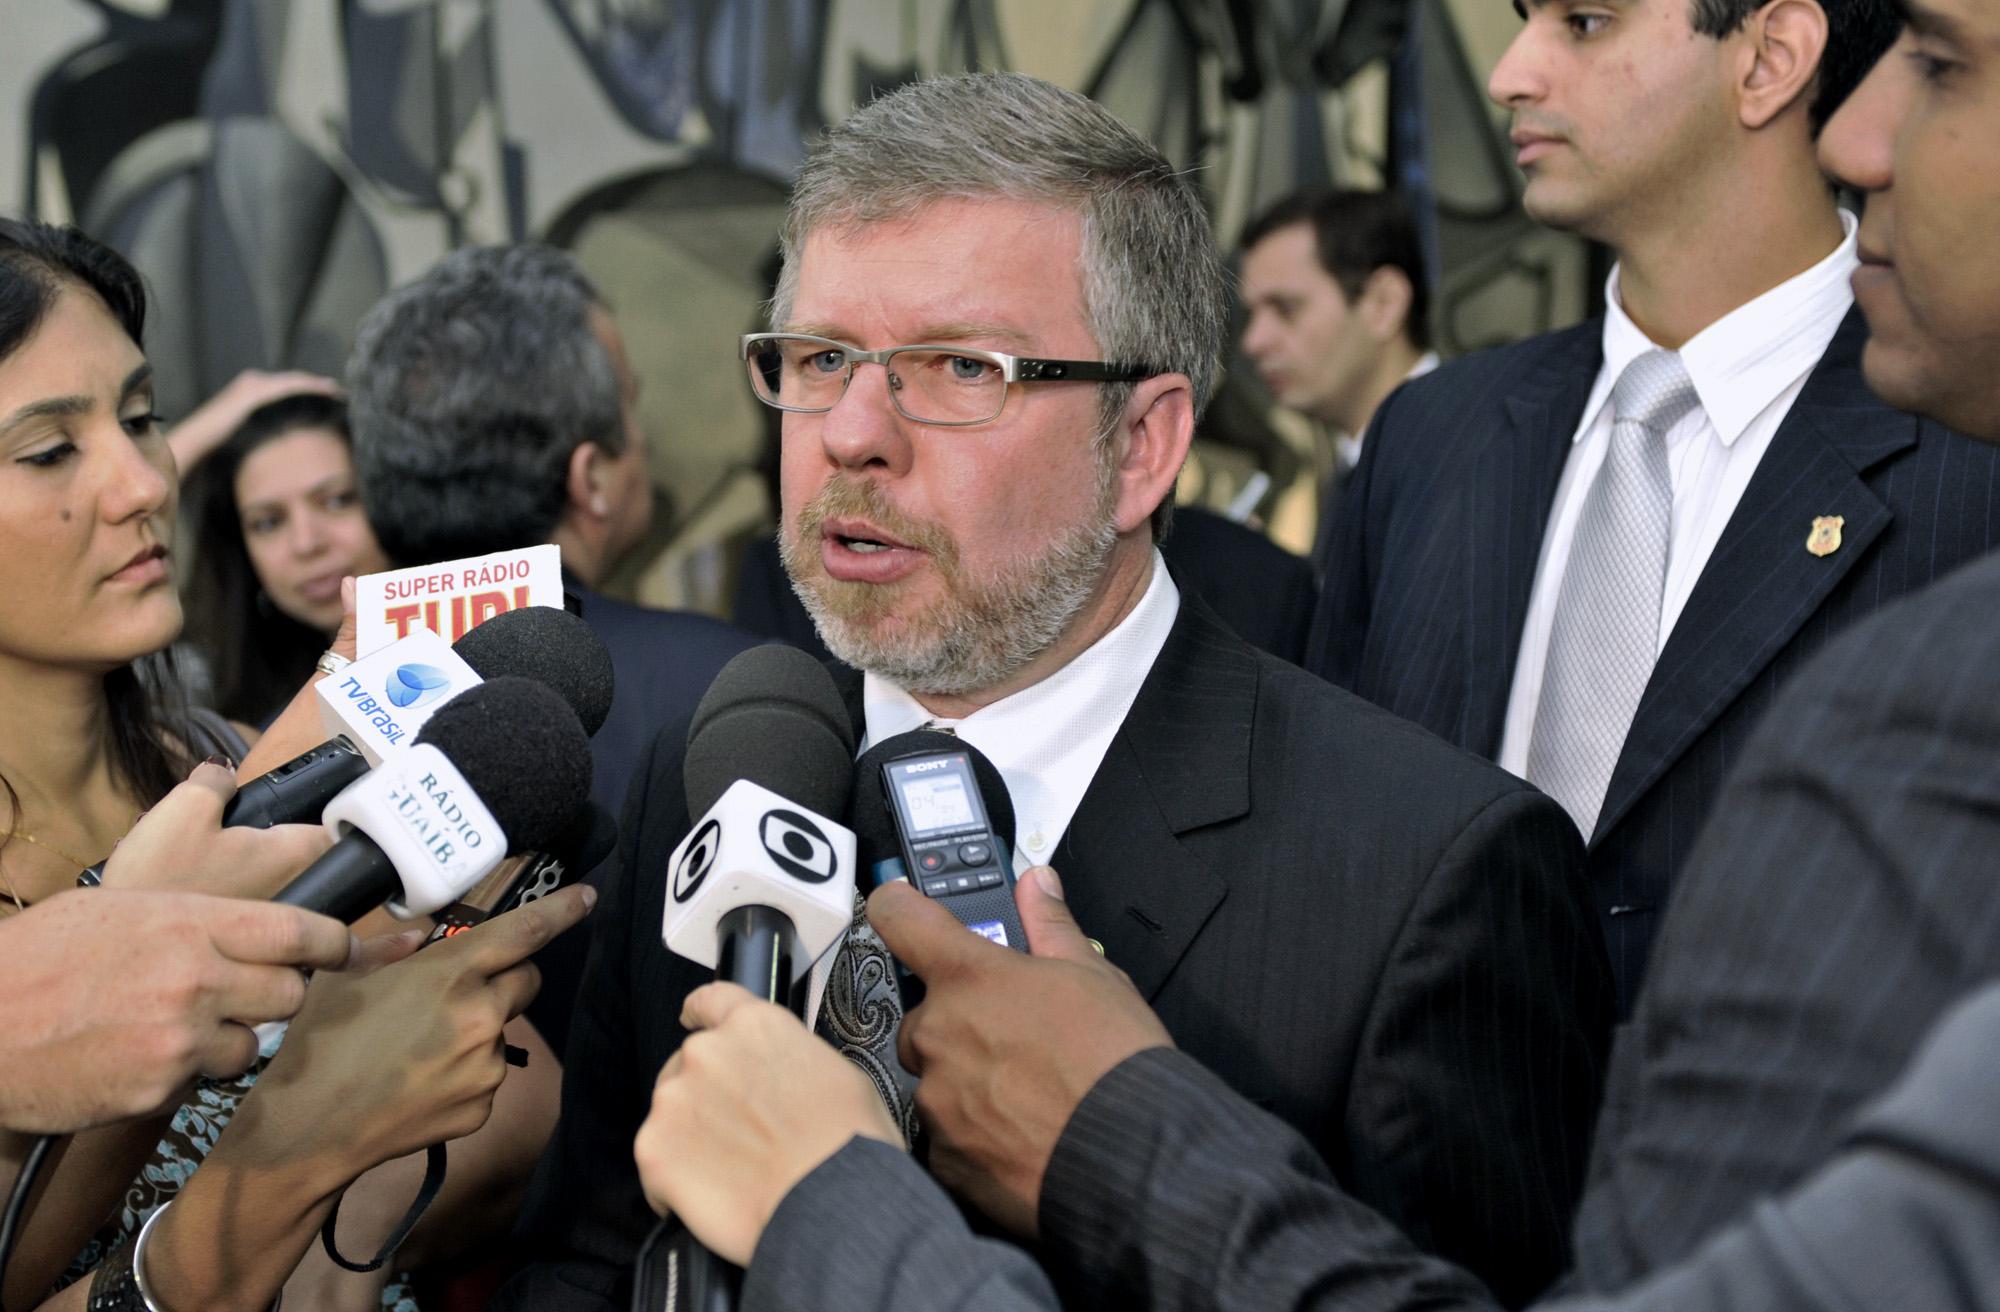 http://www.camara.gov.br/internet/bancoimagem/banco/20110329145334_20110329_PH_0006rs.jpg